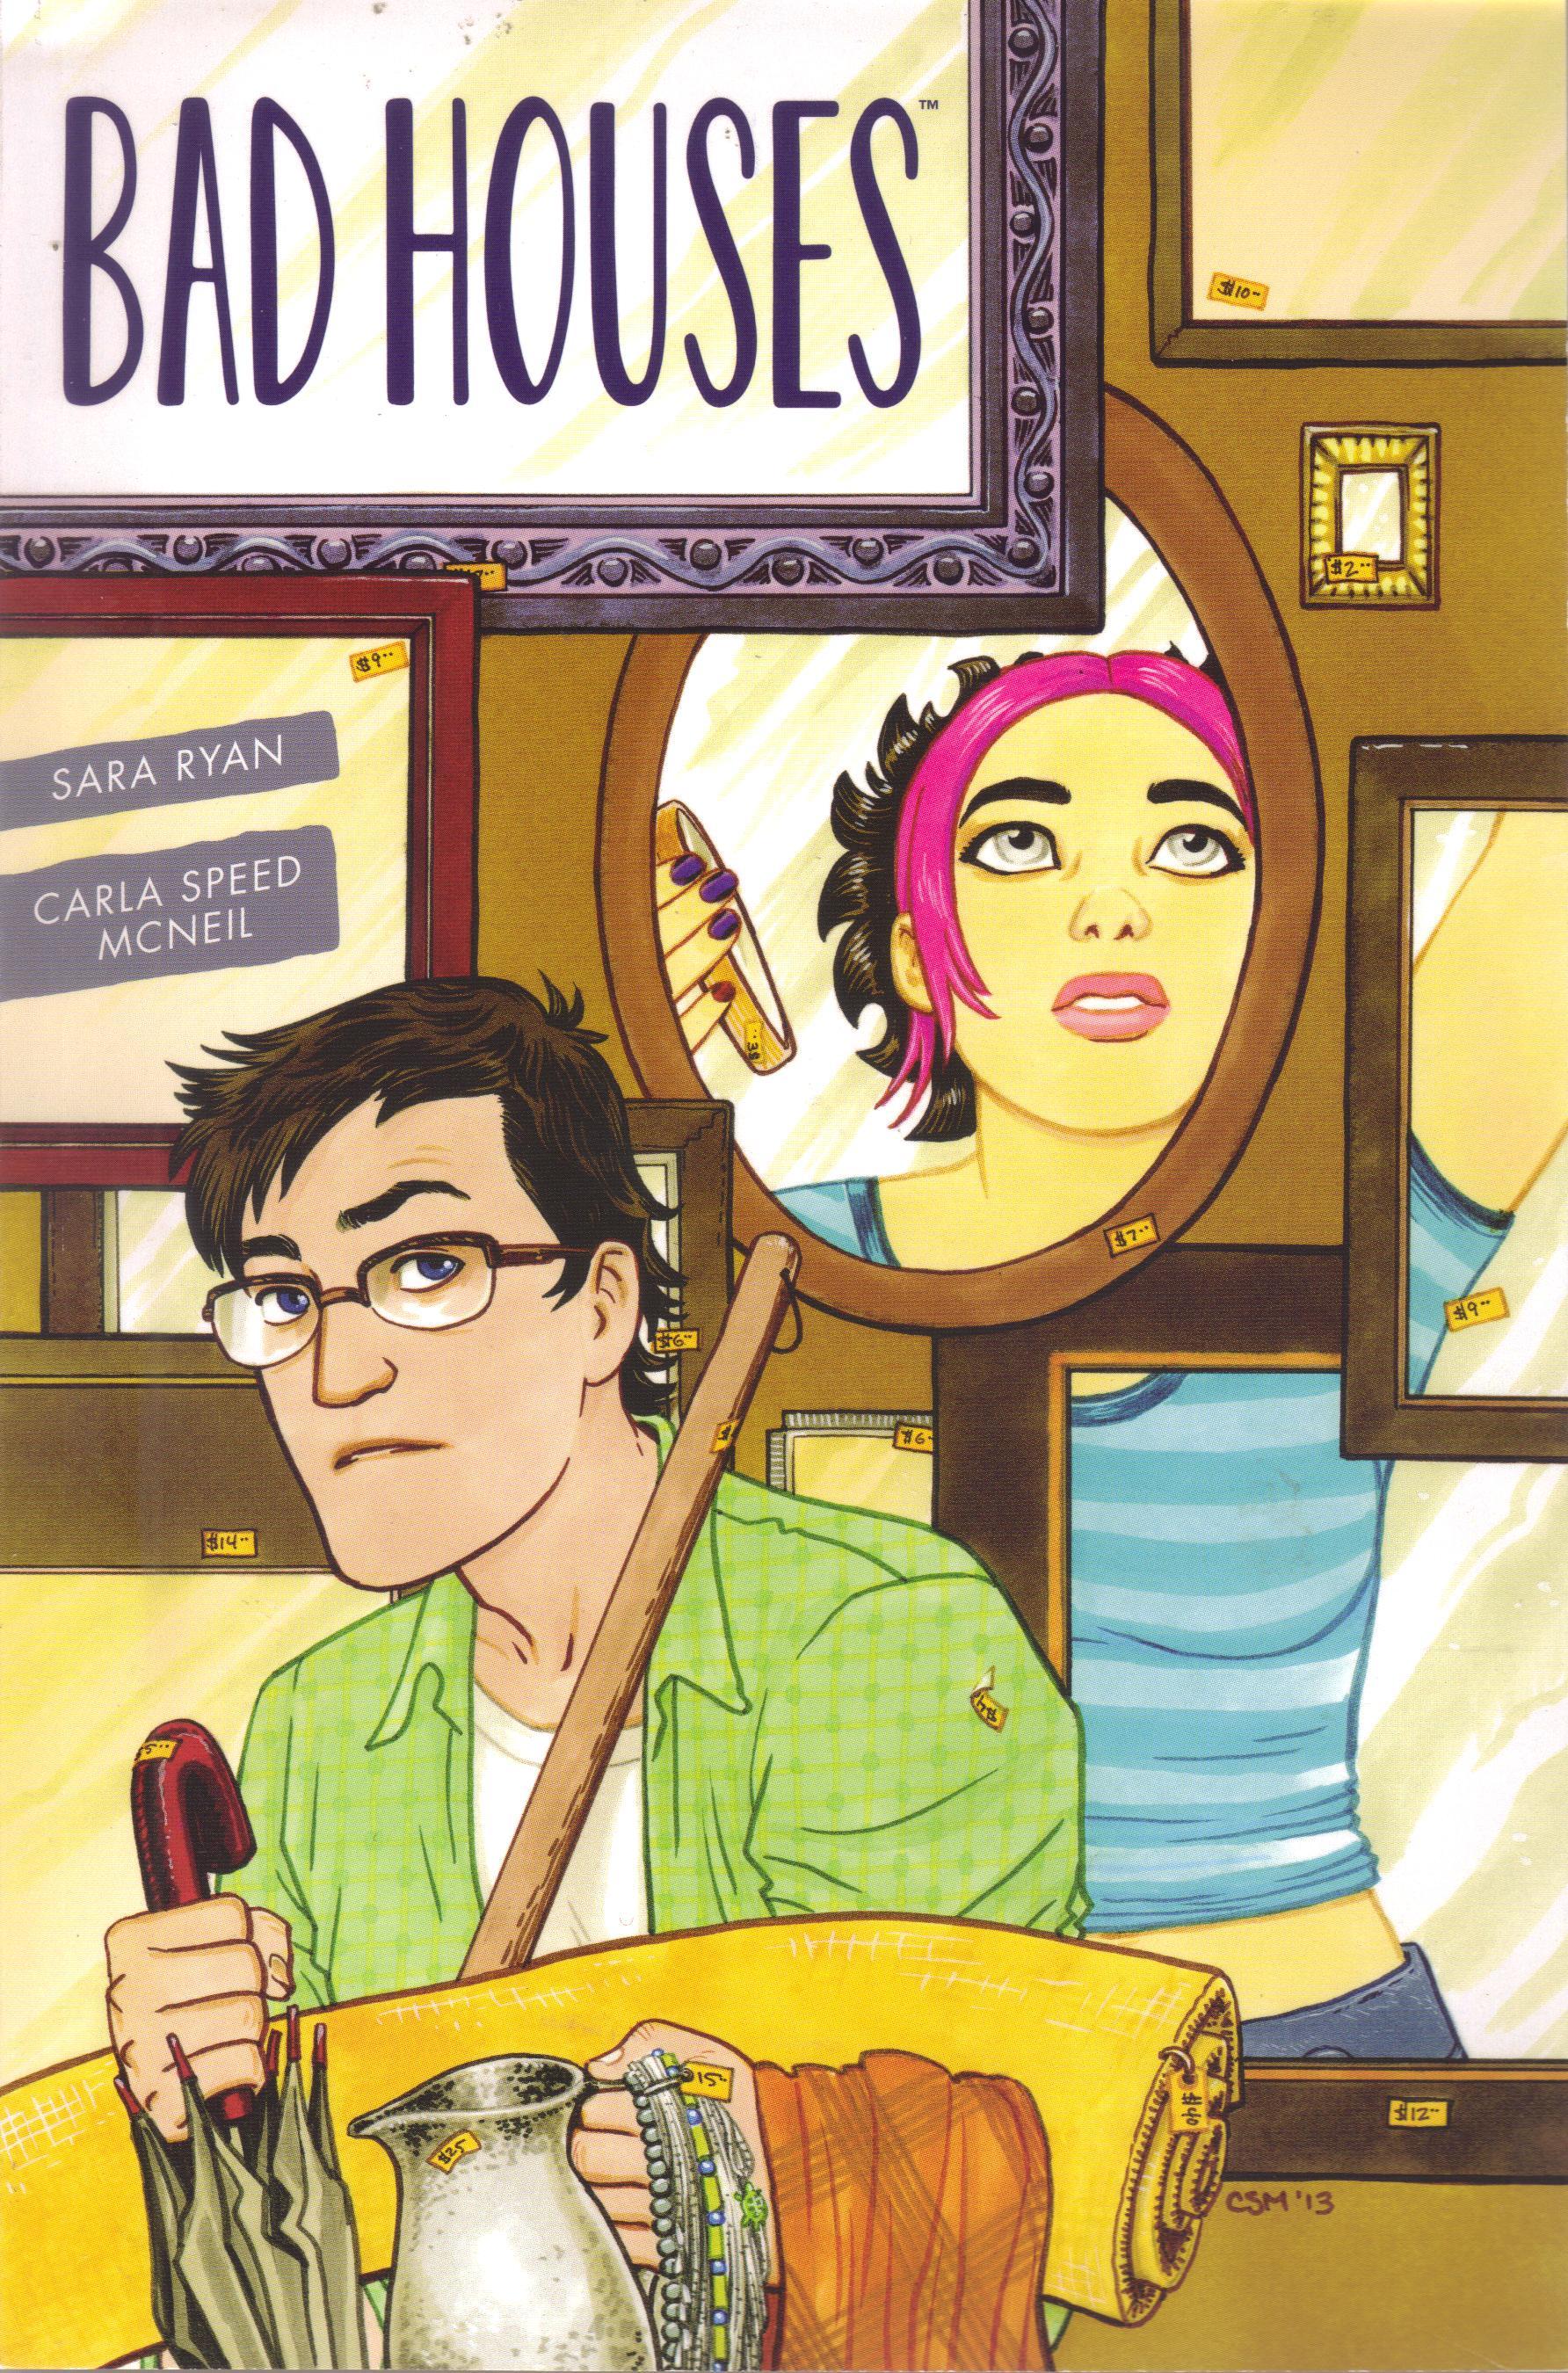 Bad Houses by Sara Ryan & Carla Speed McNeil  Amazon  |  Goodreads